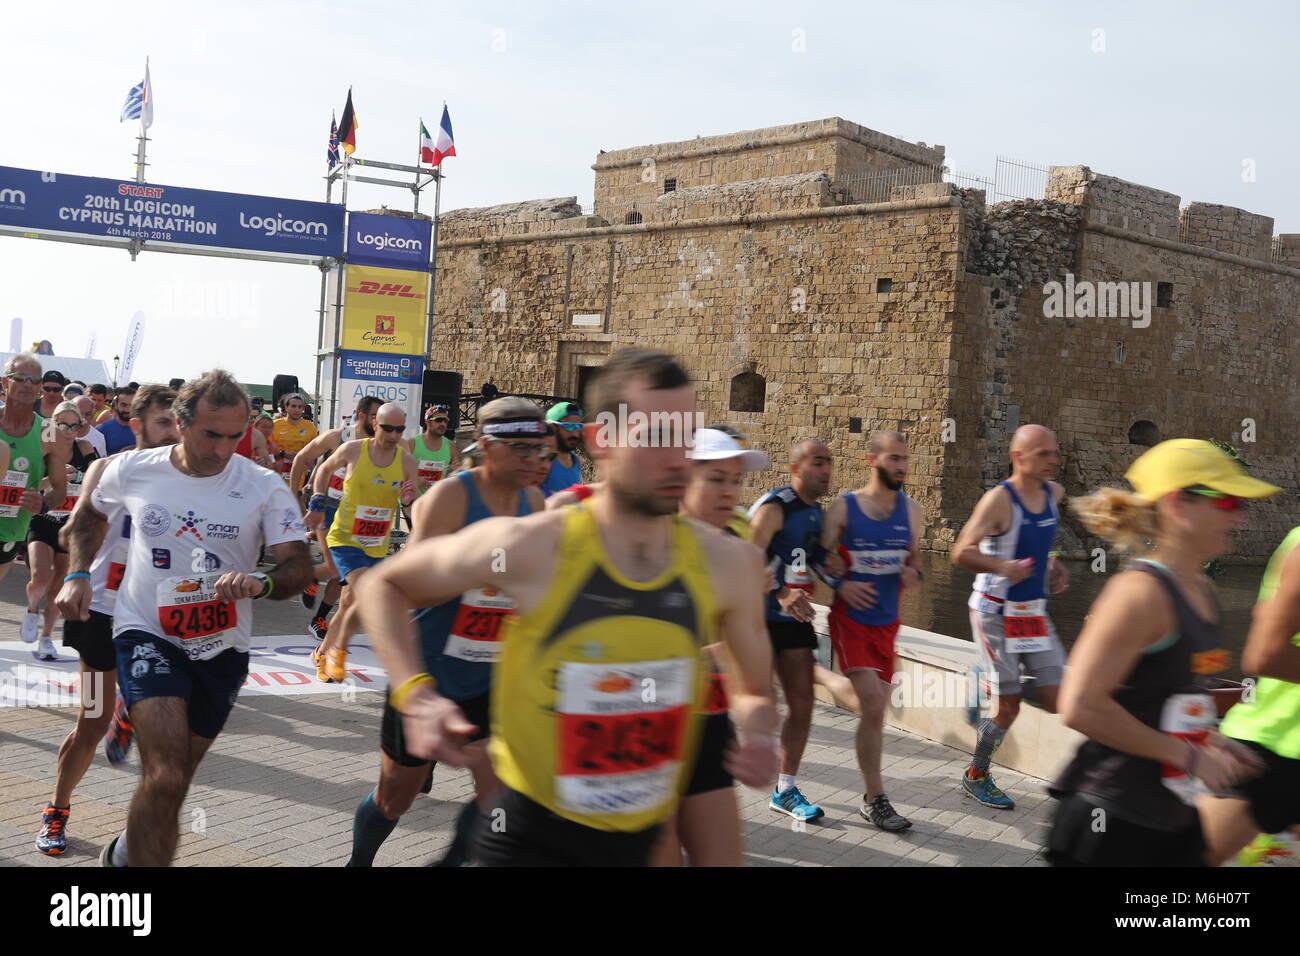 20th Logicom Cyprus marathon, half marathon, 10KM, 5KM fun run, - Stock Image